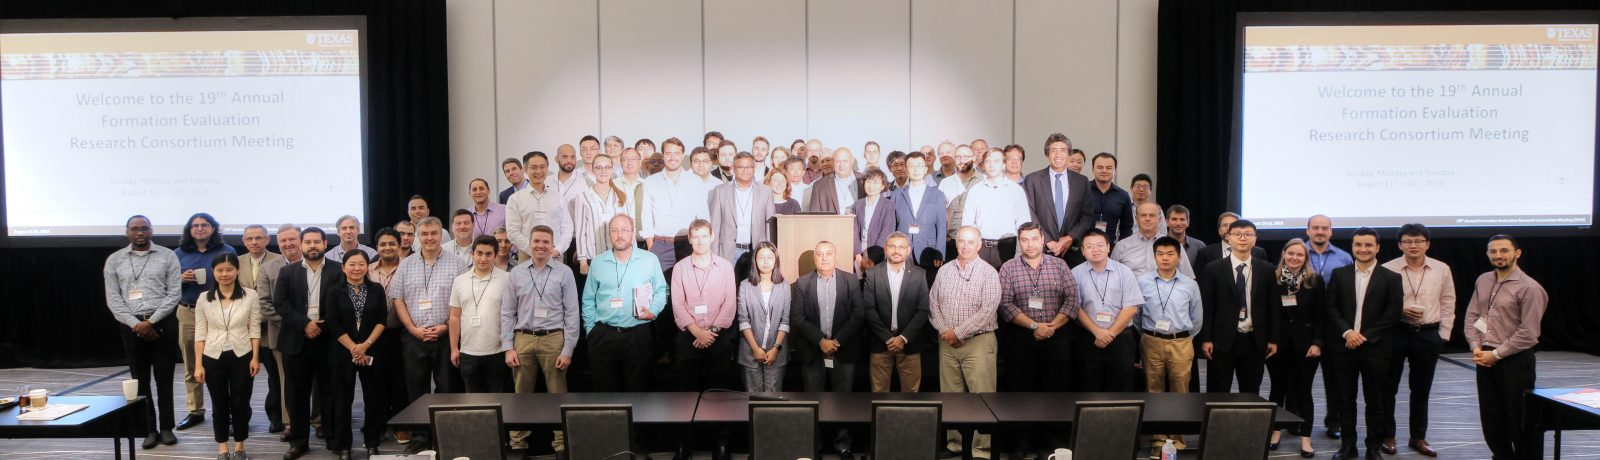 2020 FE Research Consortium Meeting